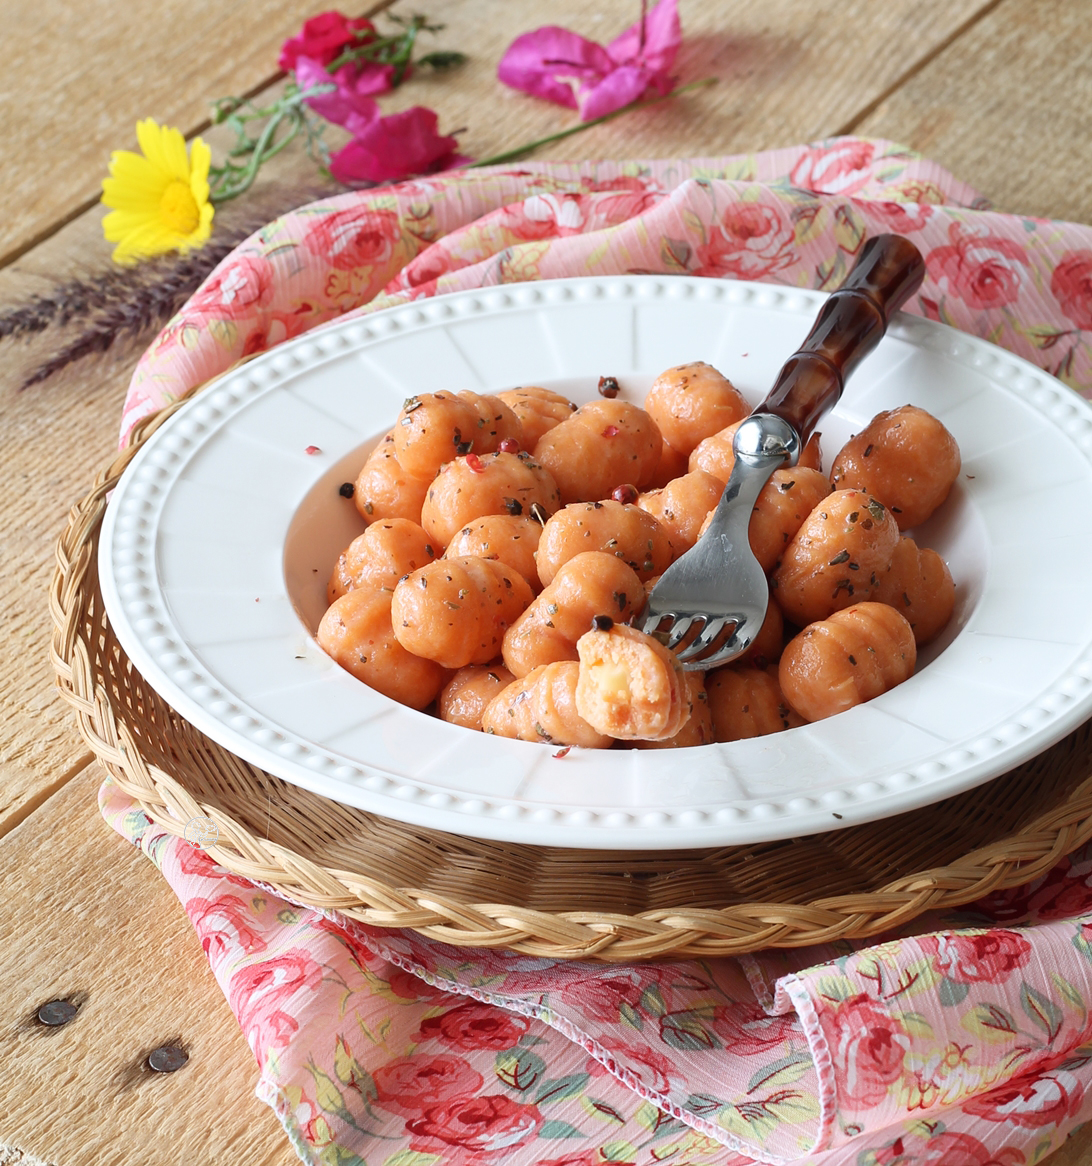 Gnocchis roses sans gluten - La Cassata Celiaca